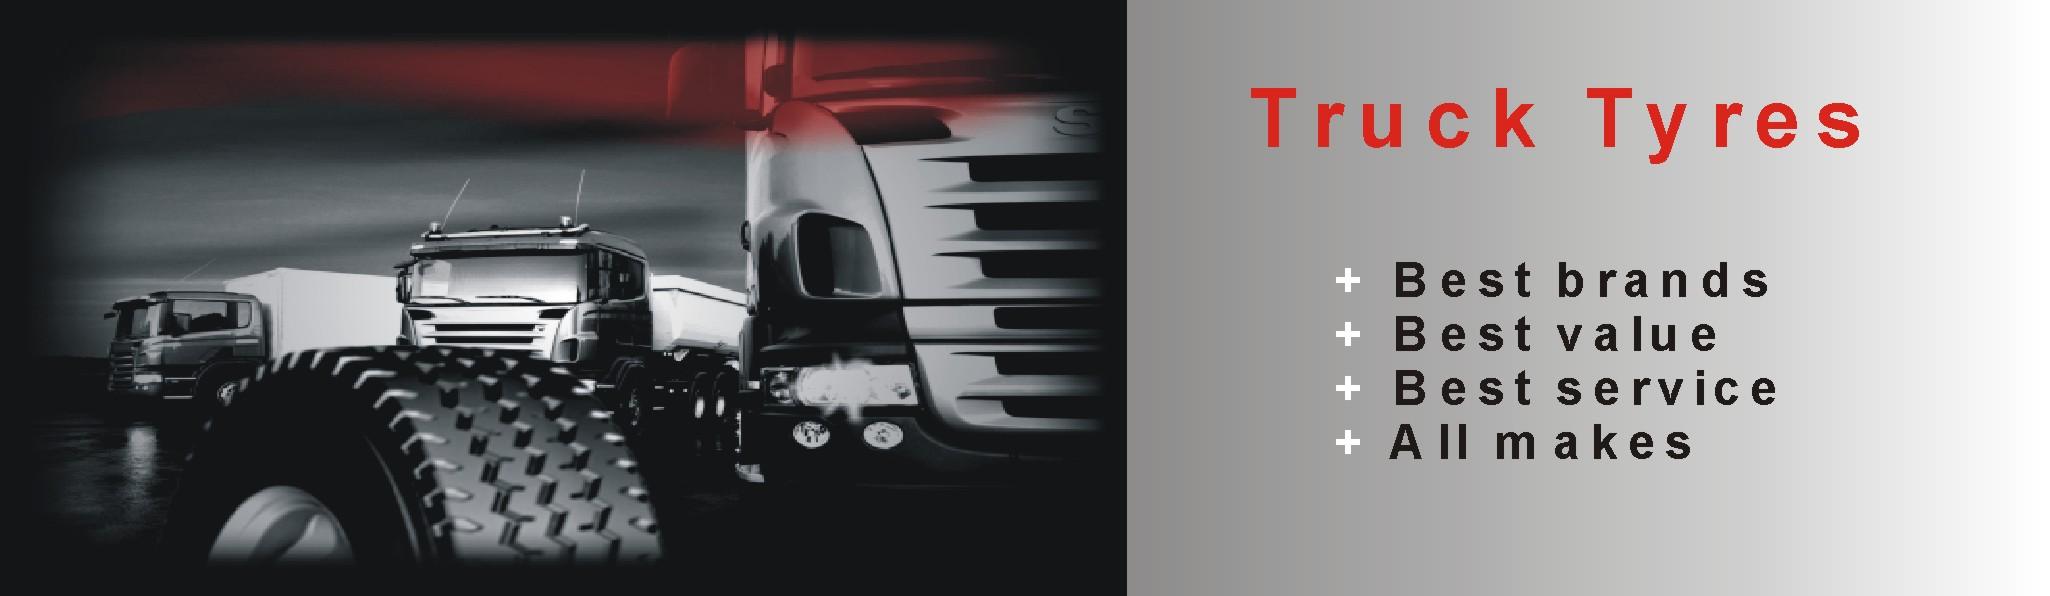 Trucktyresbanner